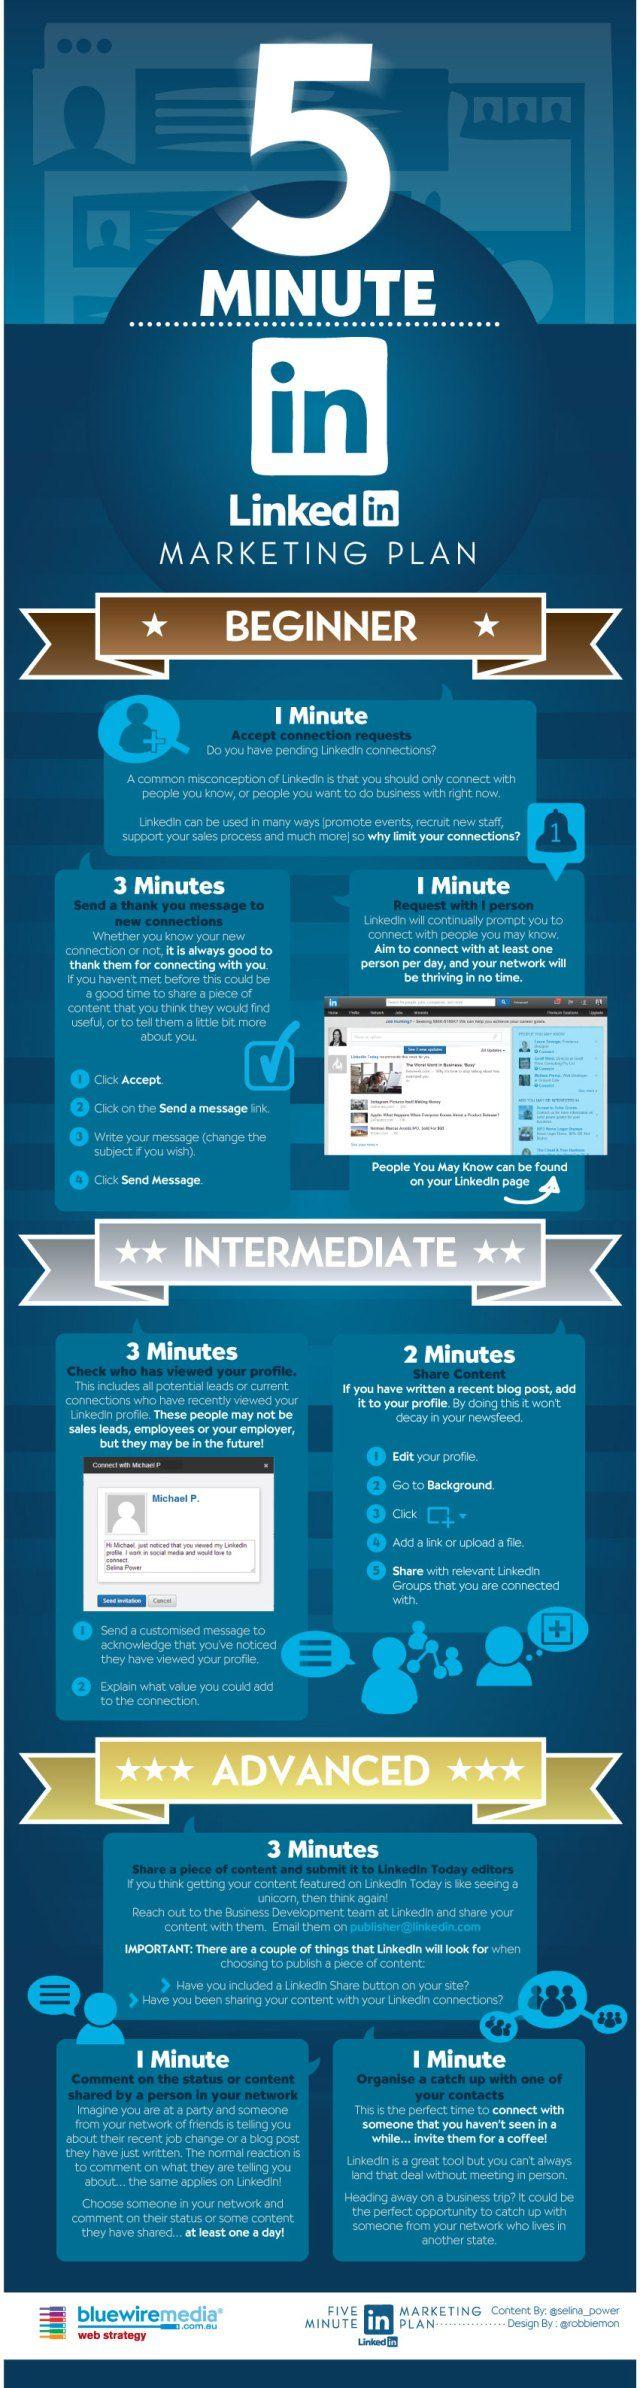 5 Minute #Linkedin Marketing Plan - #socialmedia